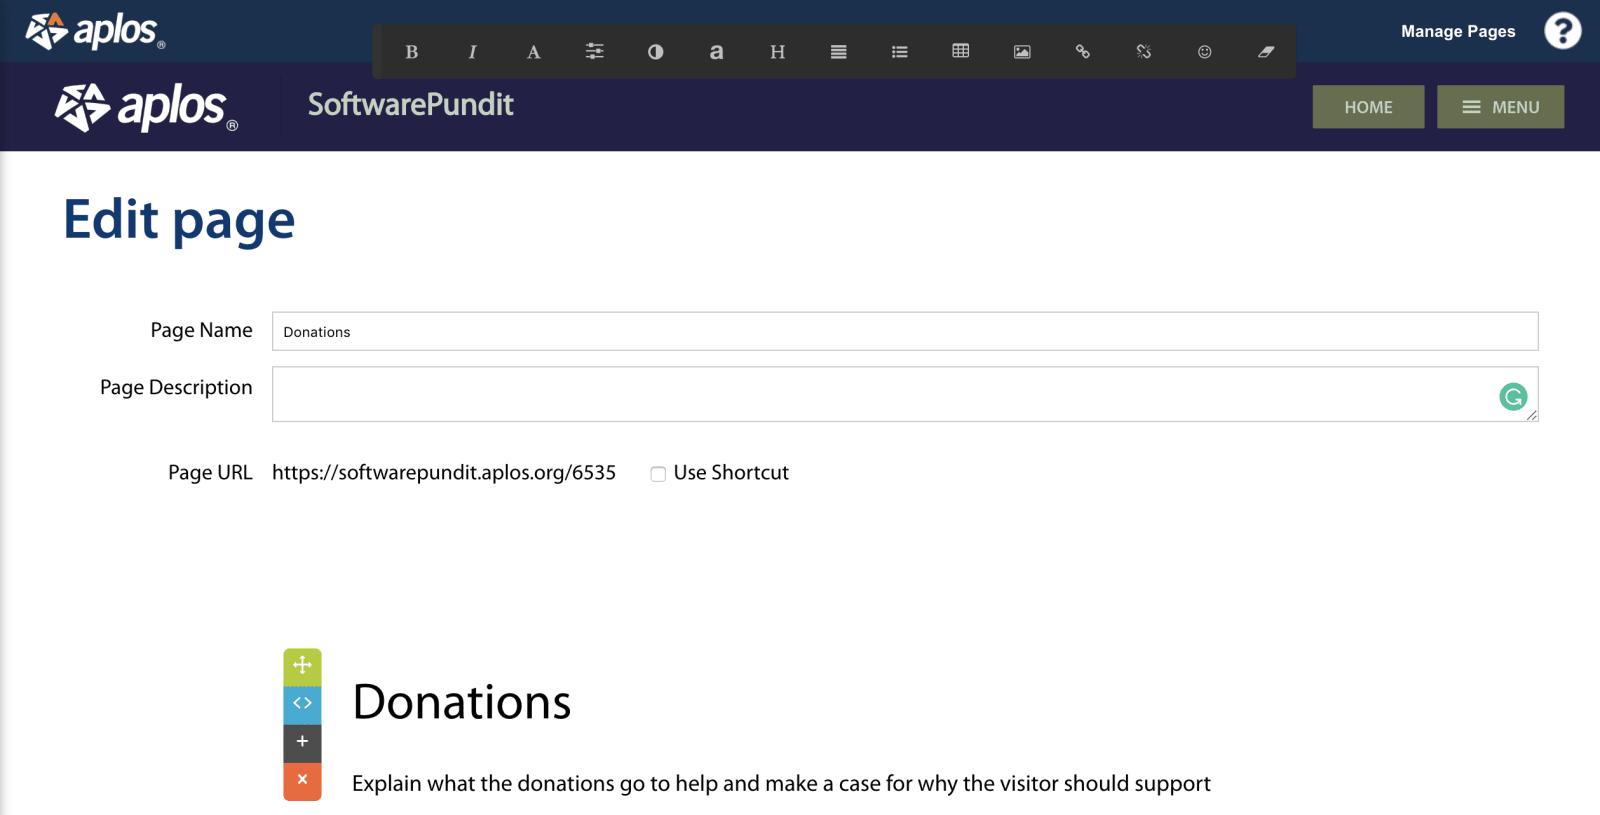 aplos website builder